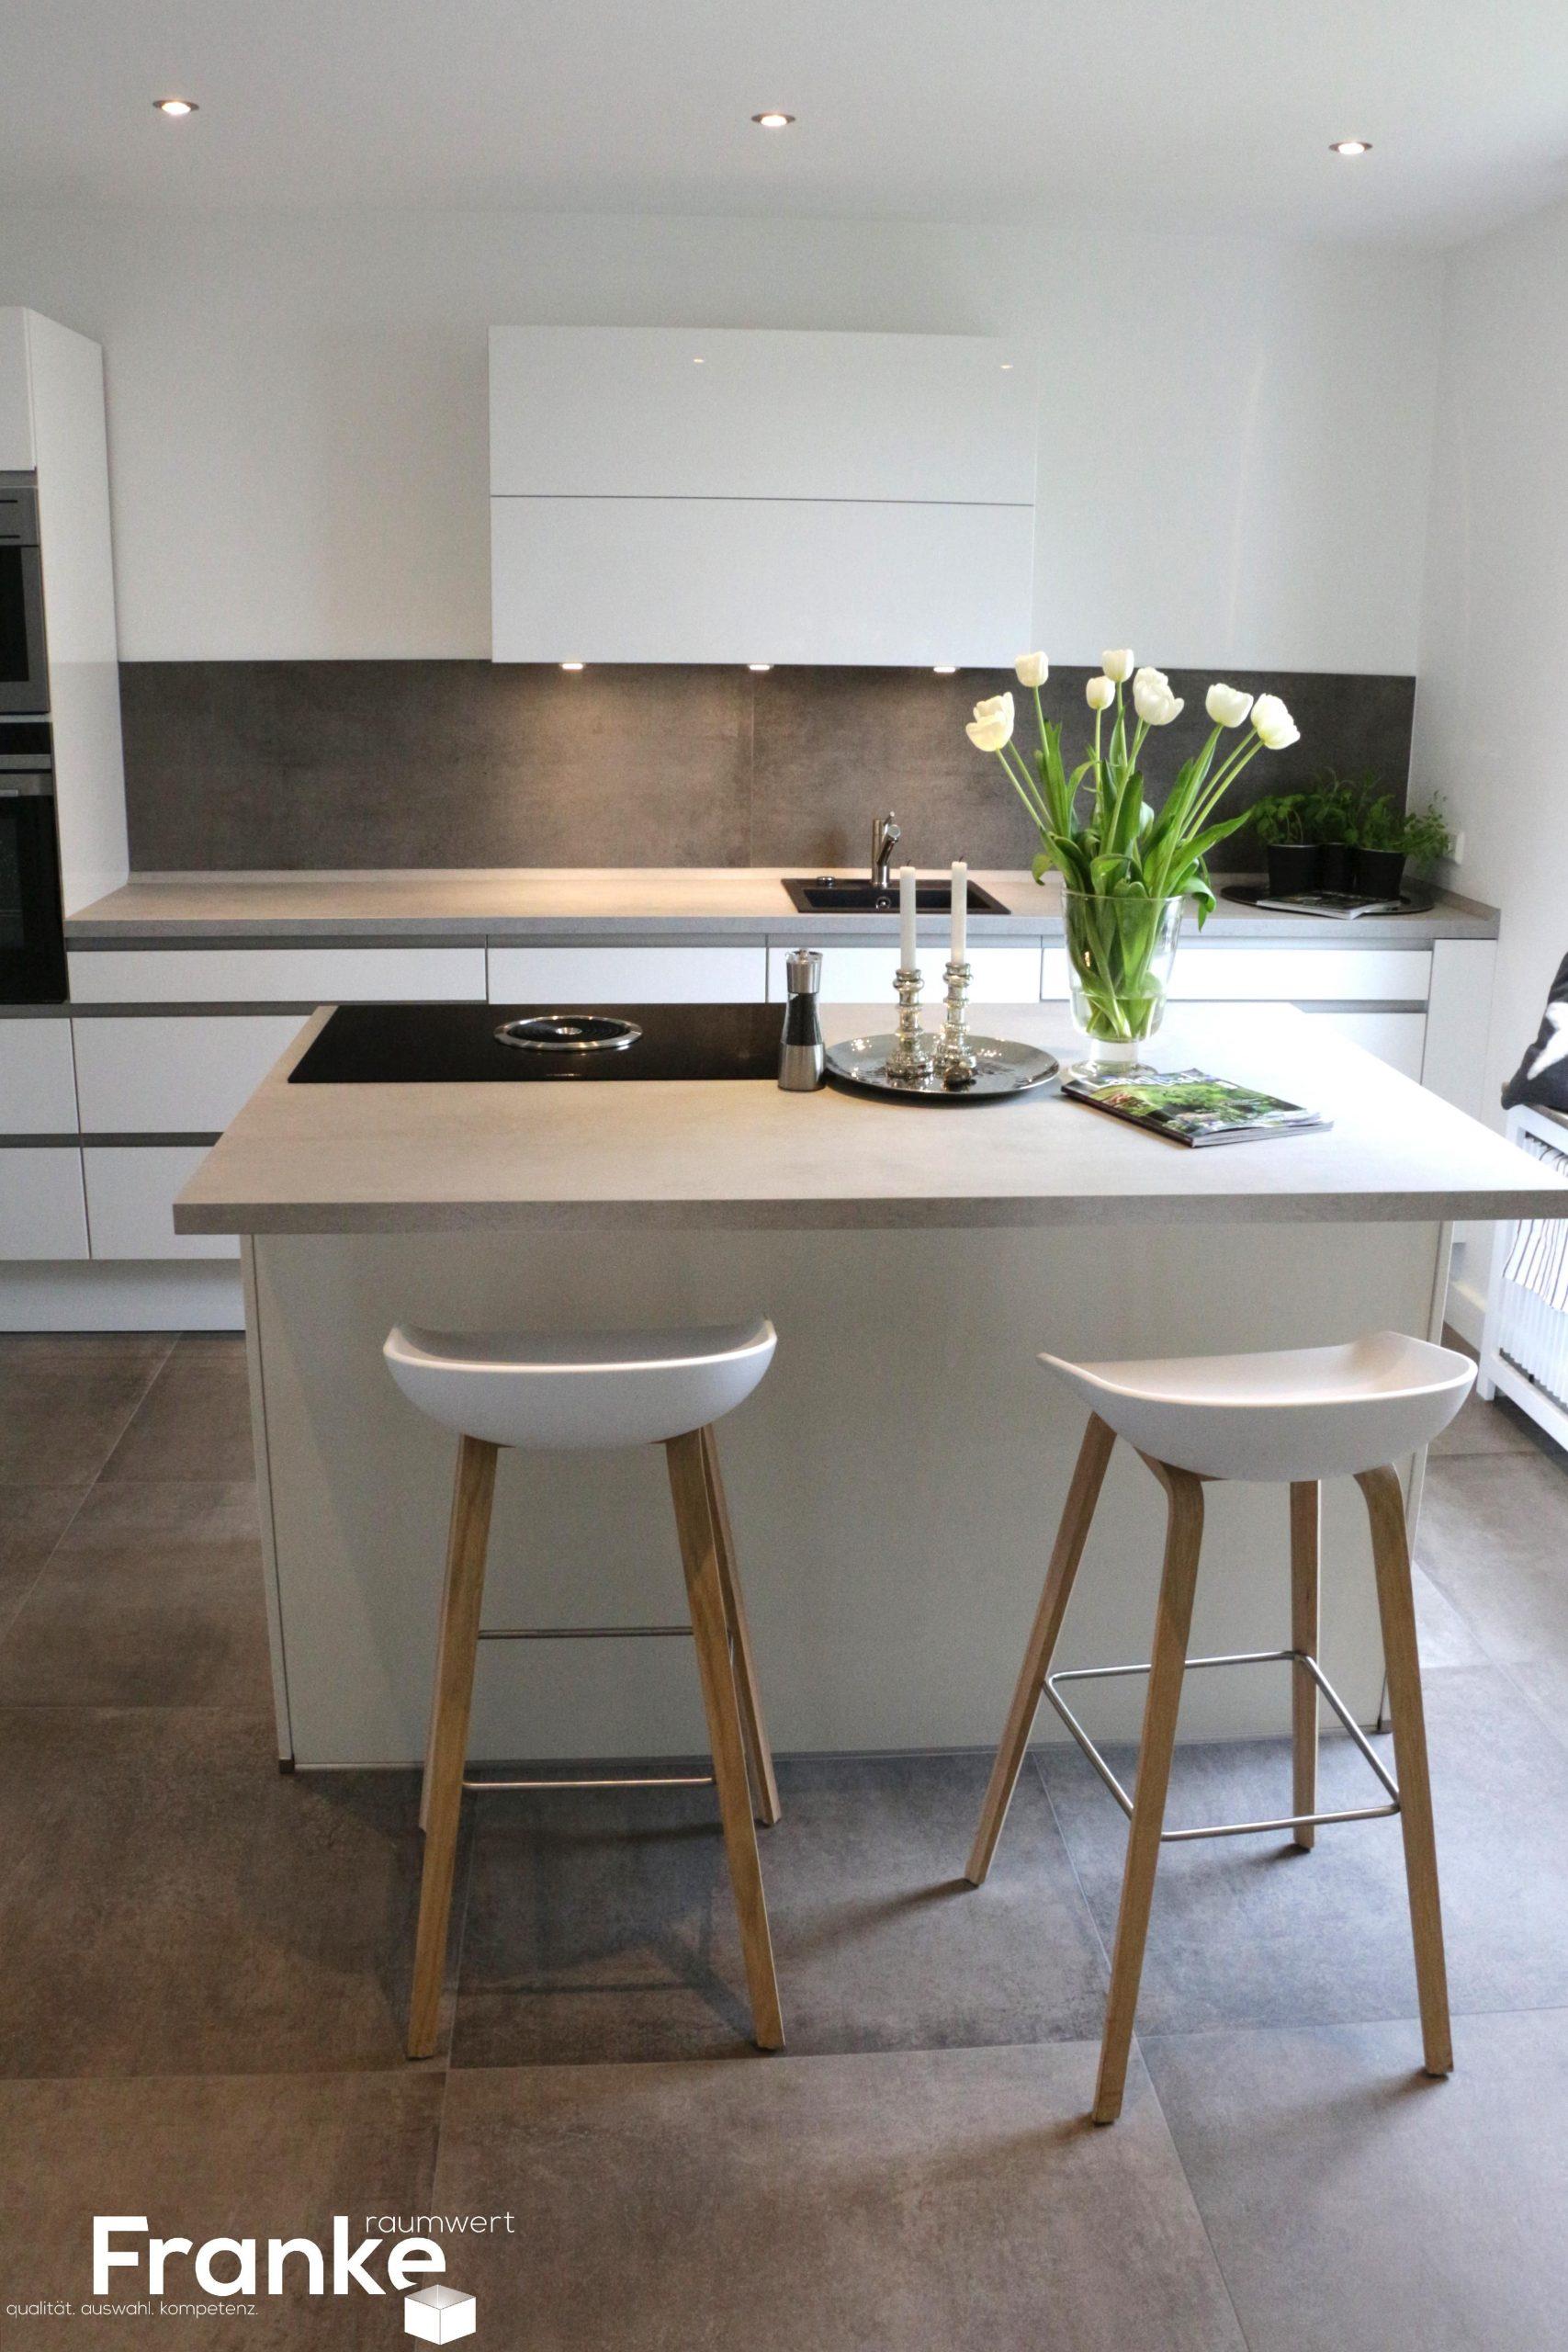 Full Size of Fliesen Offene Küche Fliesen Küche Lila Fliesen Küche Provence Fliesen Ziegeloptik Küche Küche Fliesen Für Küche